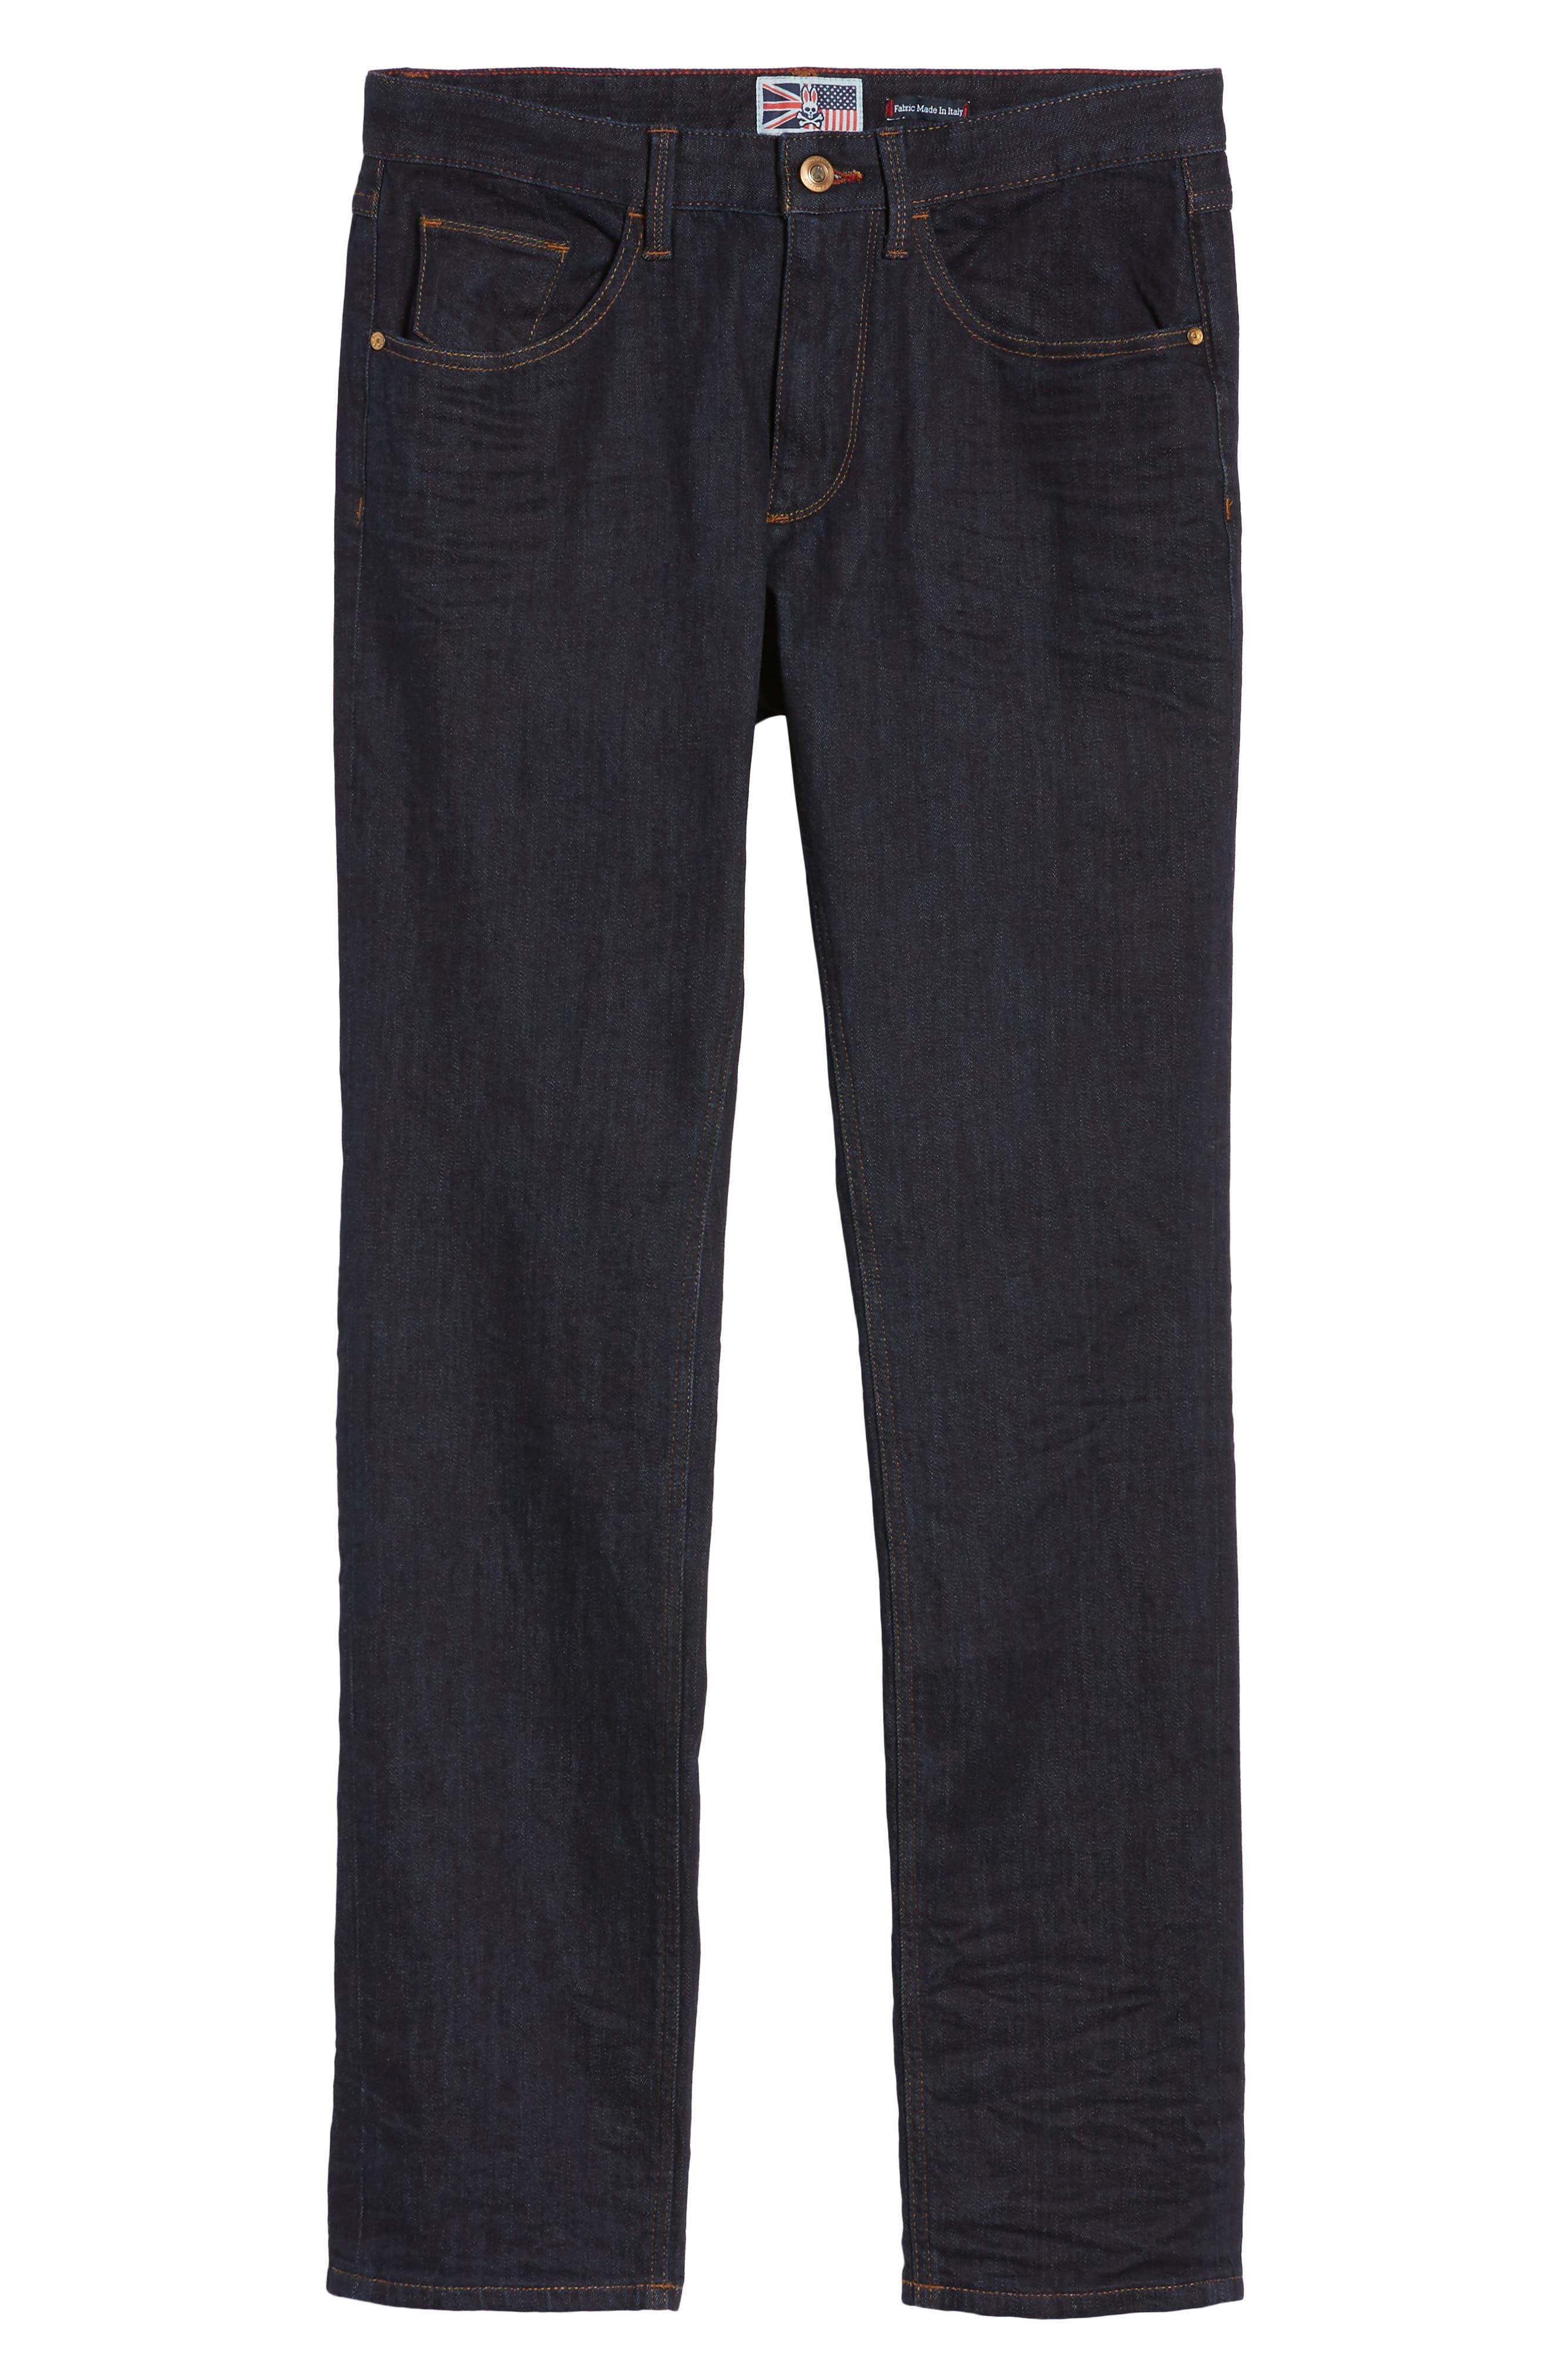 Canal Slim Fit Jeans,                             Alternate thumbnail 6, color,                             460